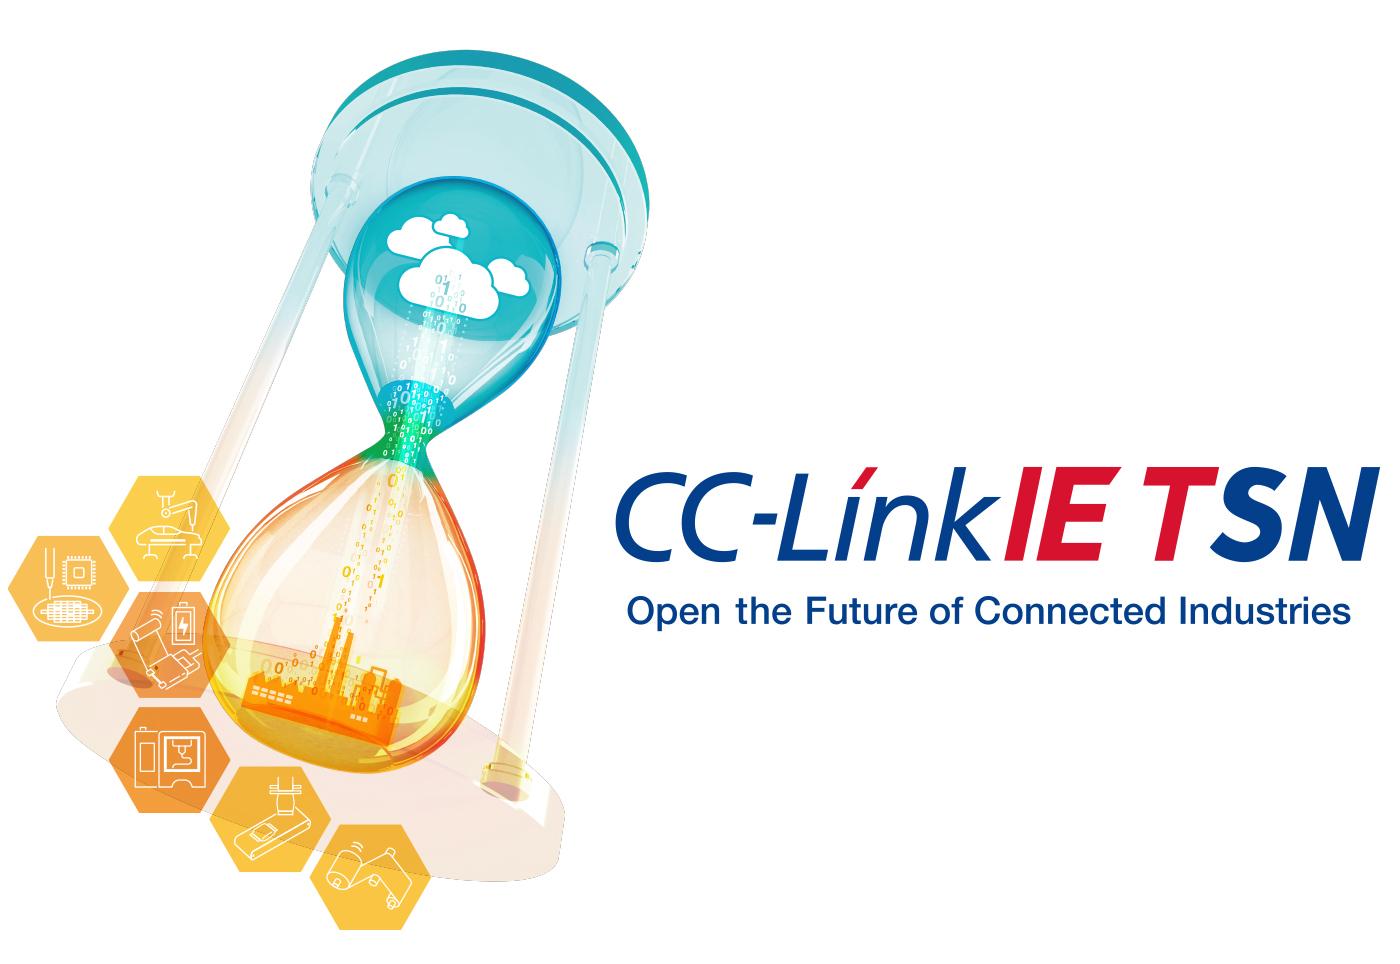 CC-Link IE TSN